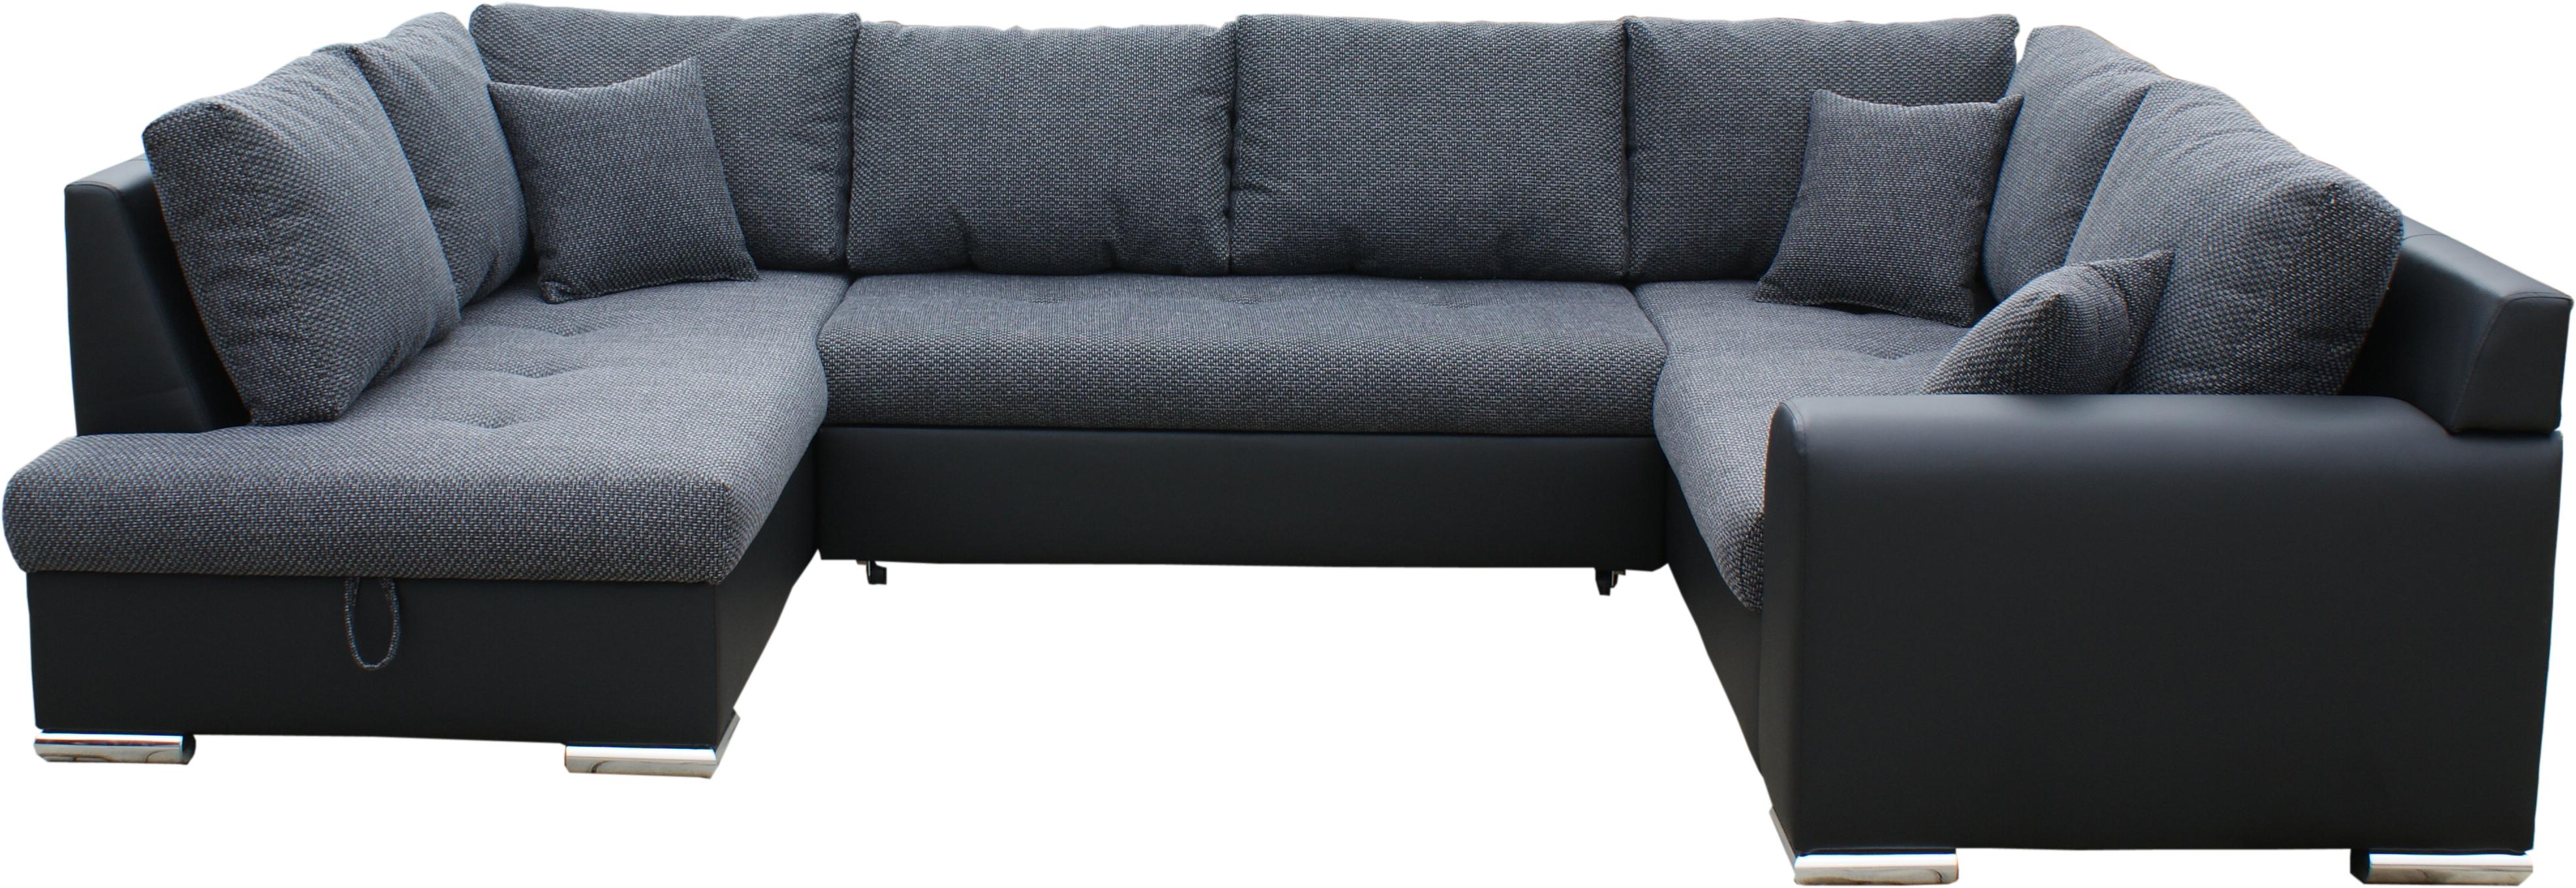 Rohová sedací souprava U - BRW - Olimp U (šedá + černá) (P)